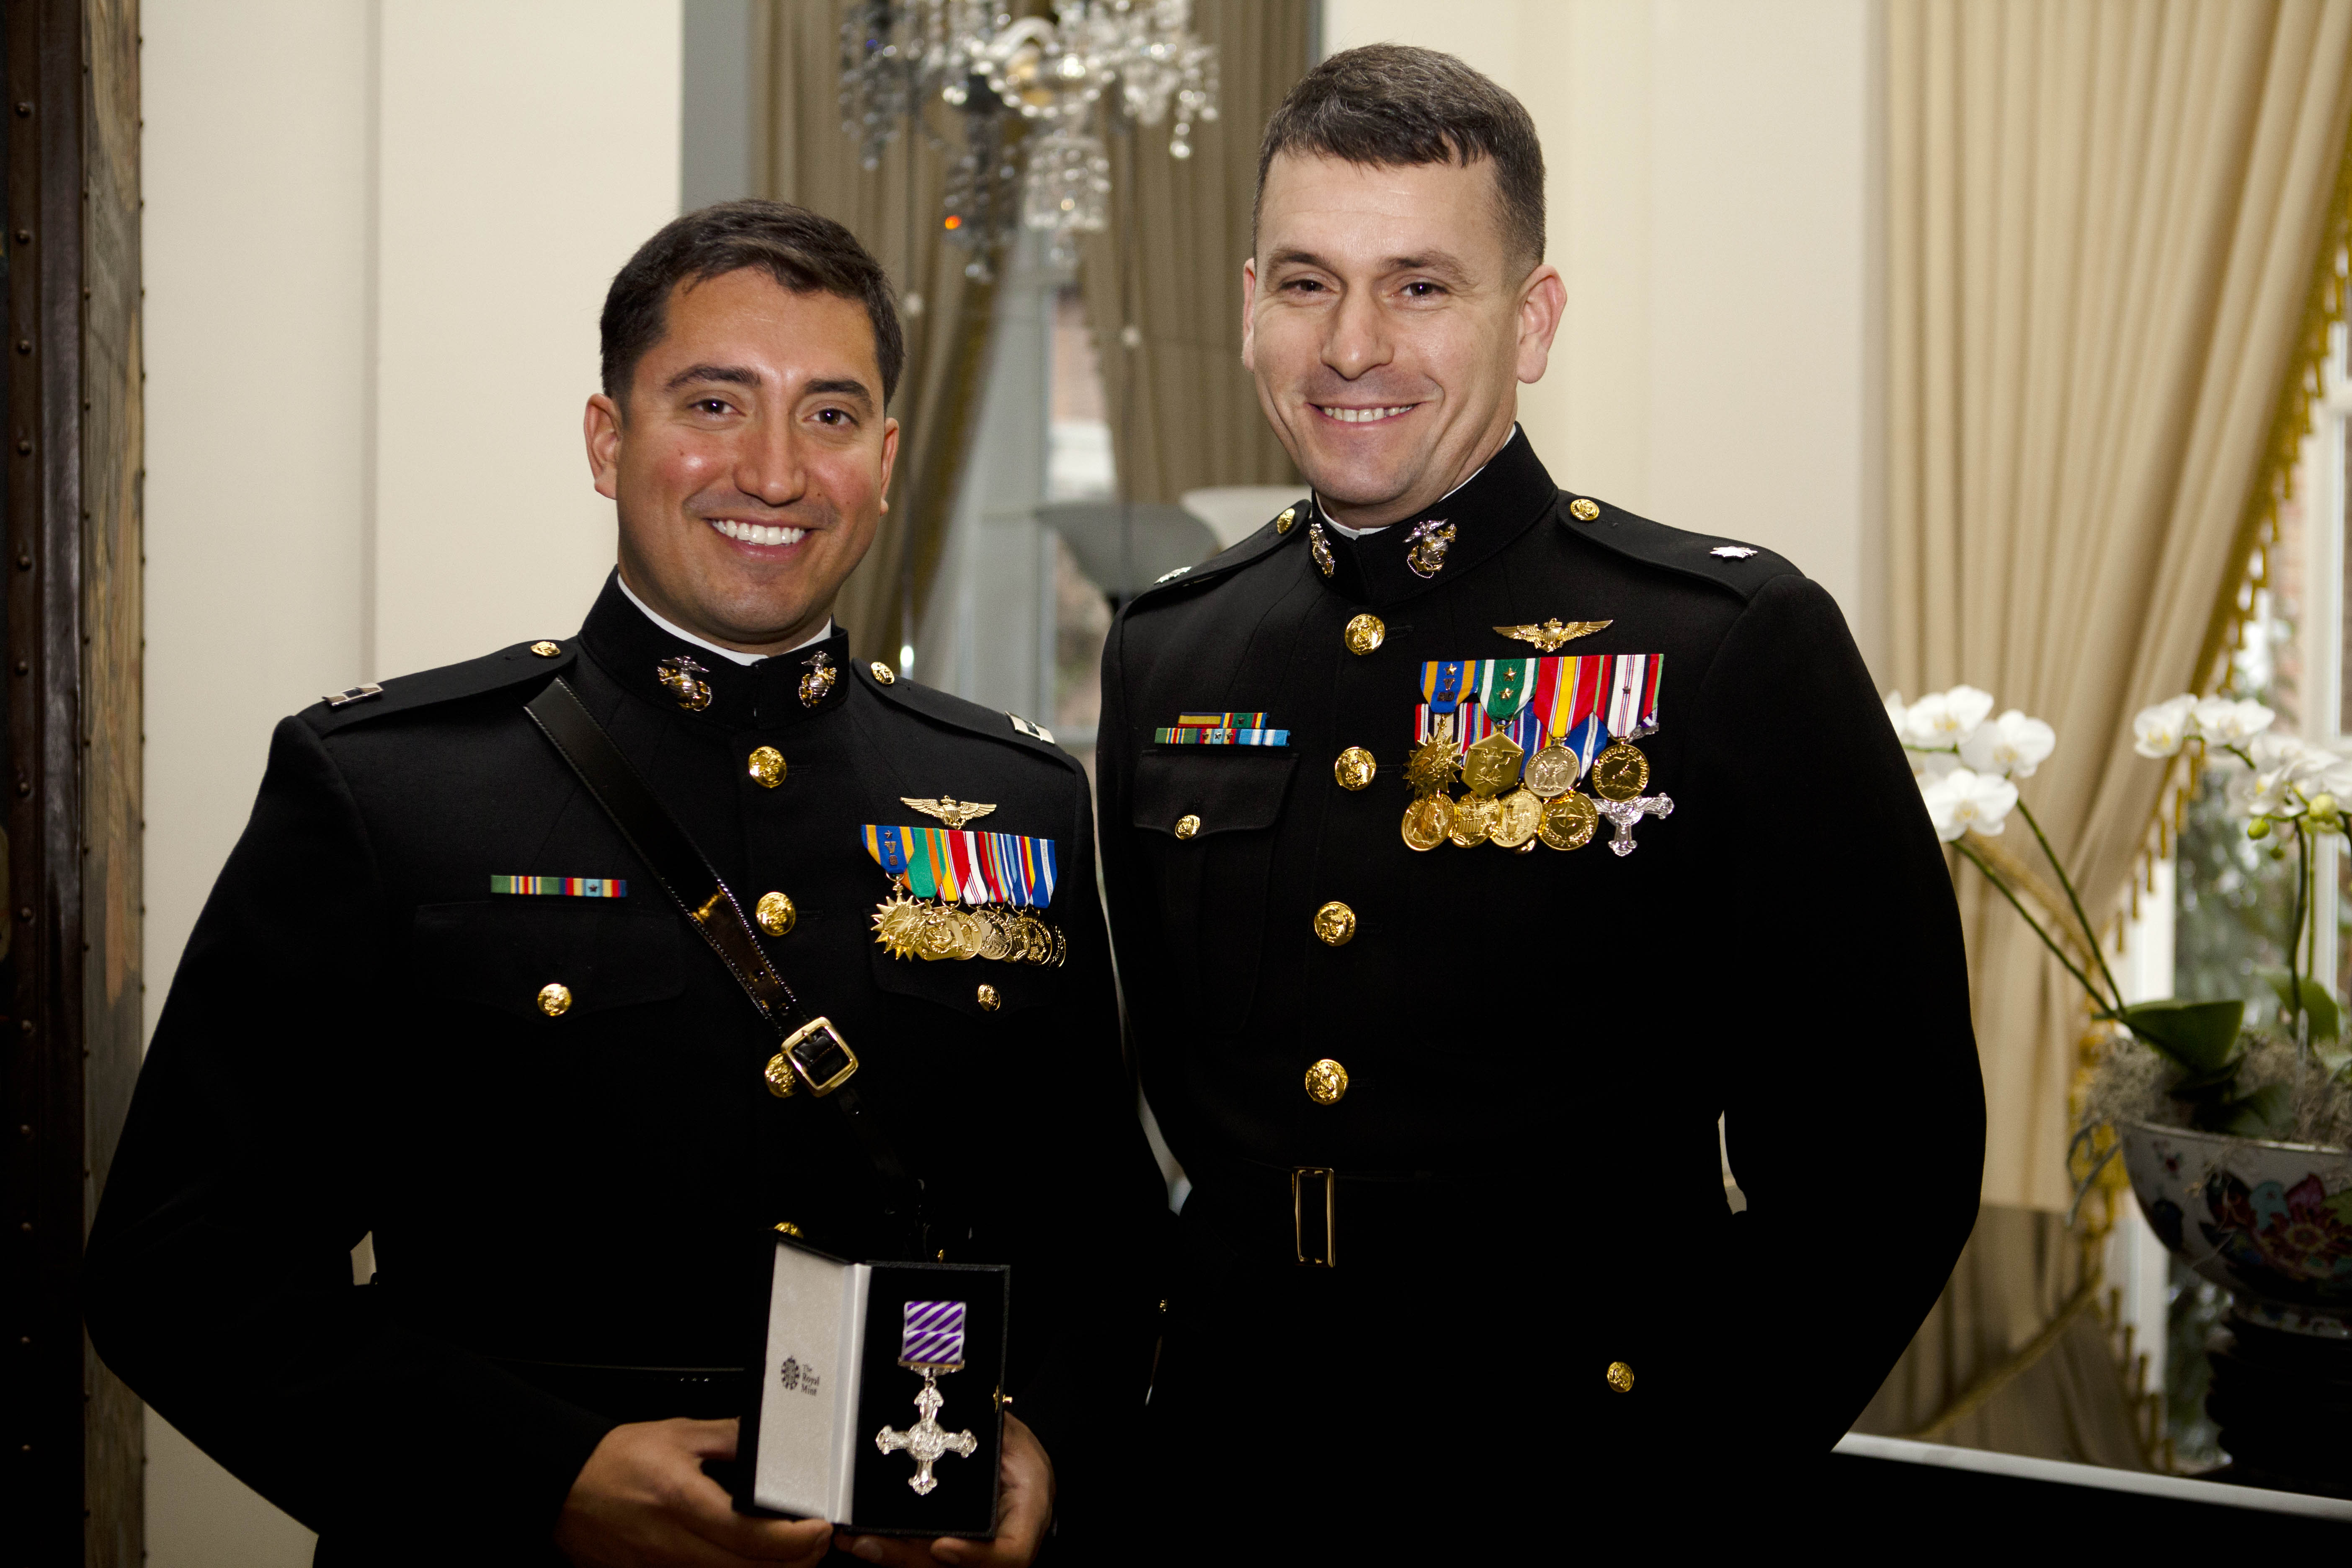 Marine Aviator Receives High Flying British Honor For